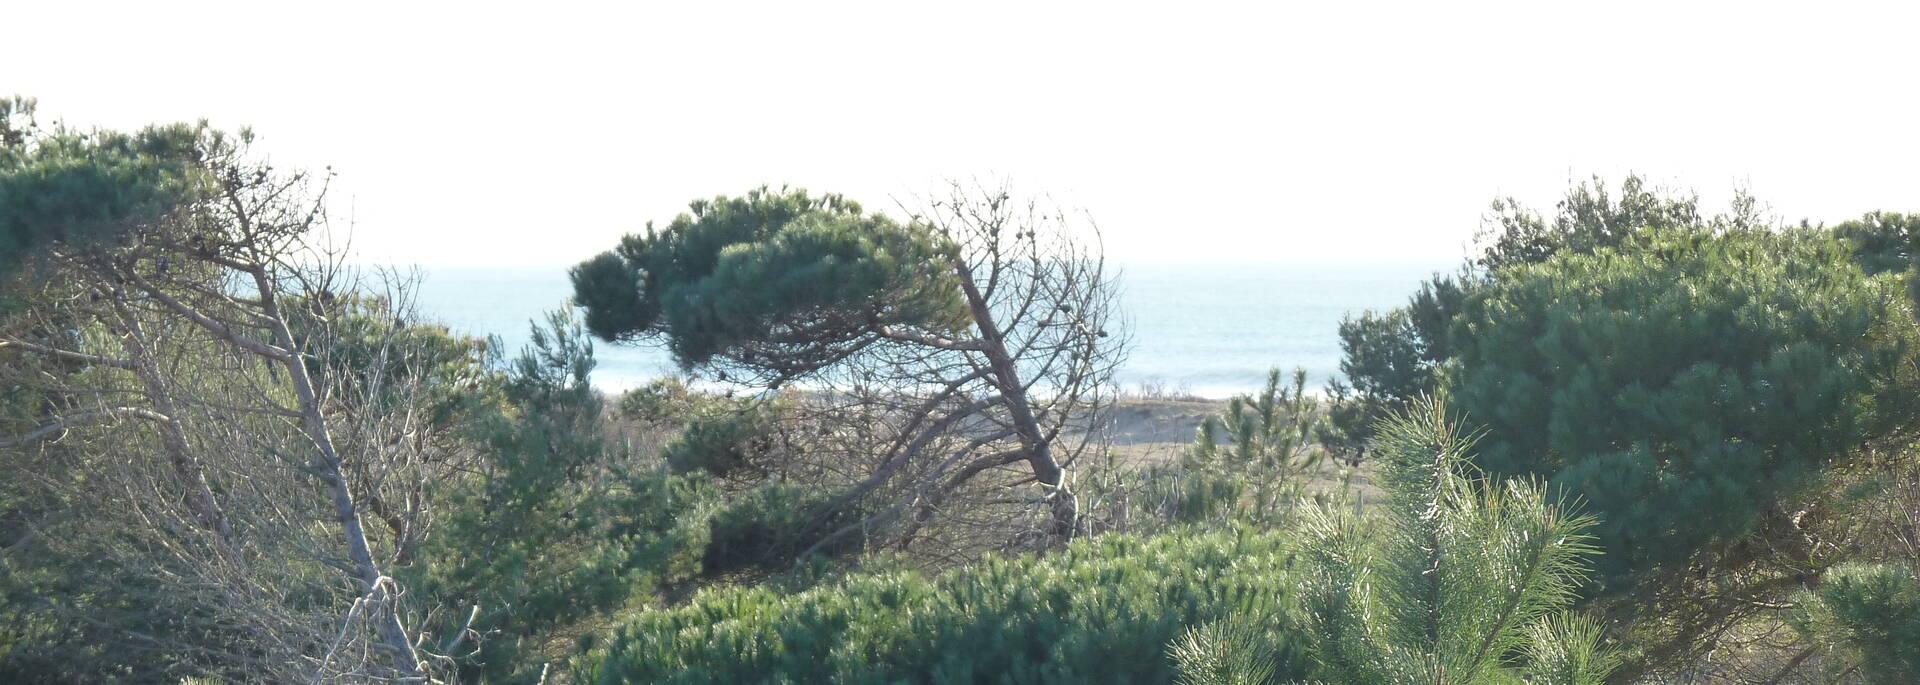 Zugang zum Strand bei Boyardville